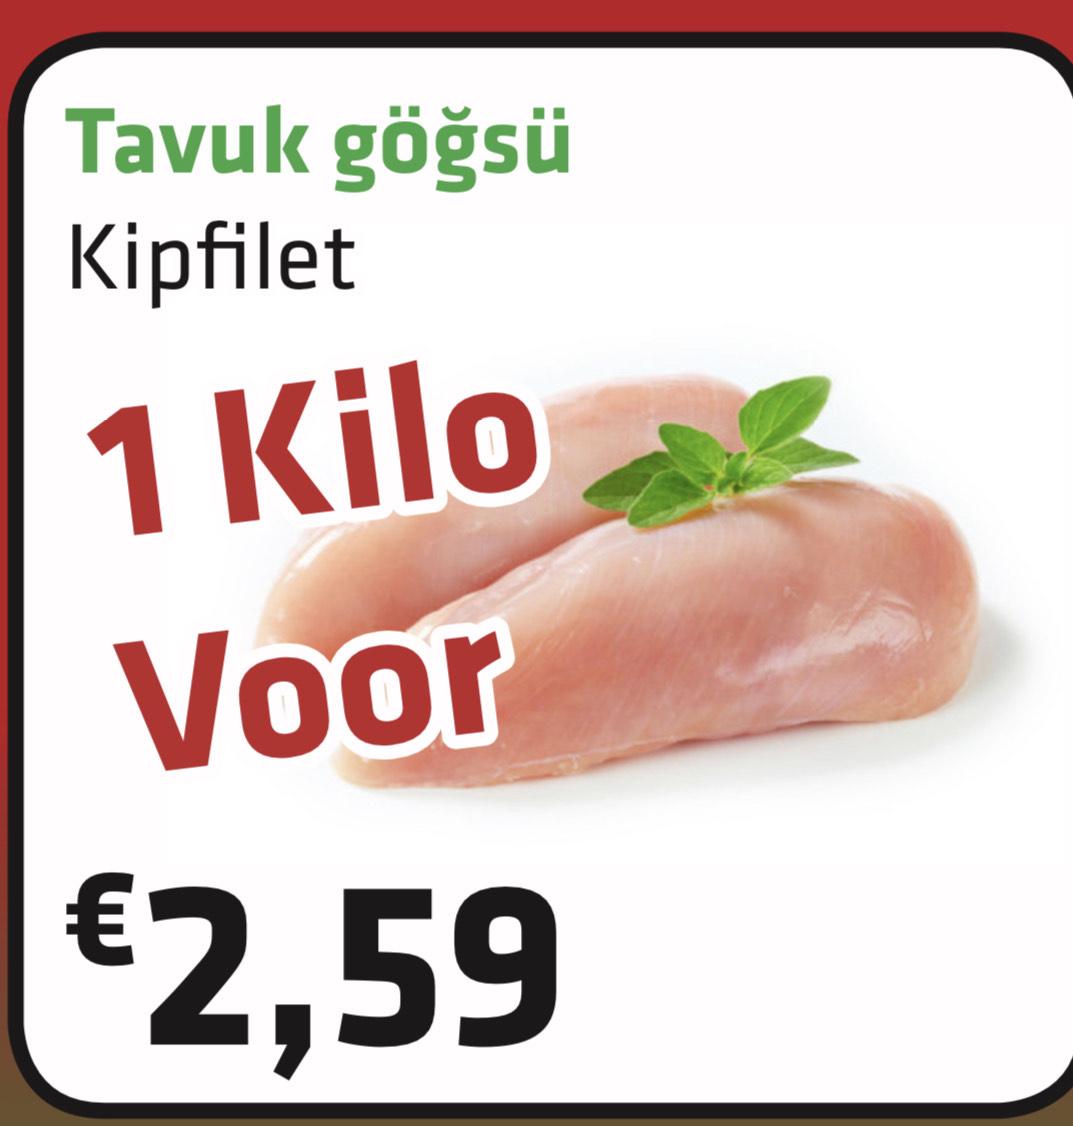 [Amersfoort] lokale Turk, super aanbiedingen! O.a 1 kg Kipfilet voor €2,59